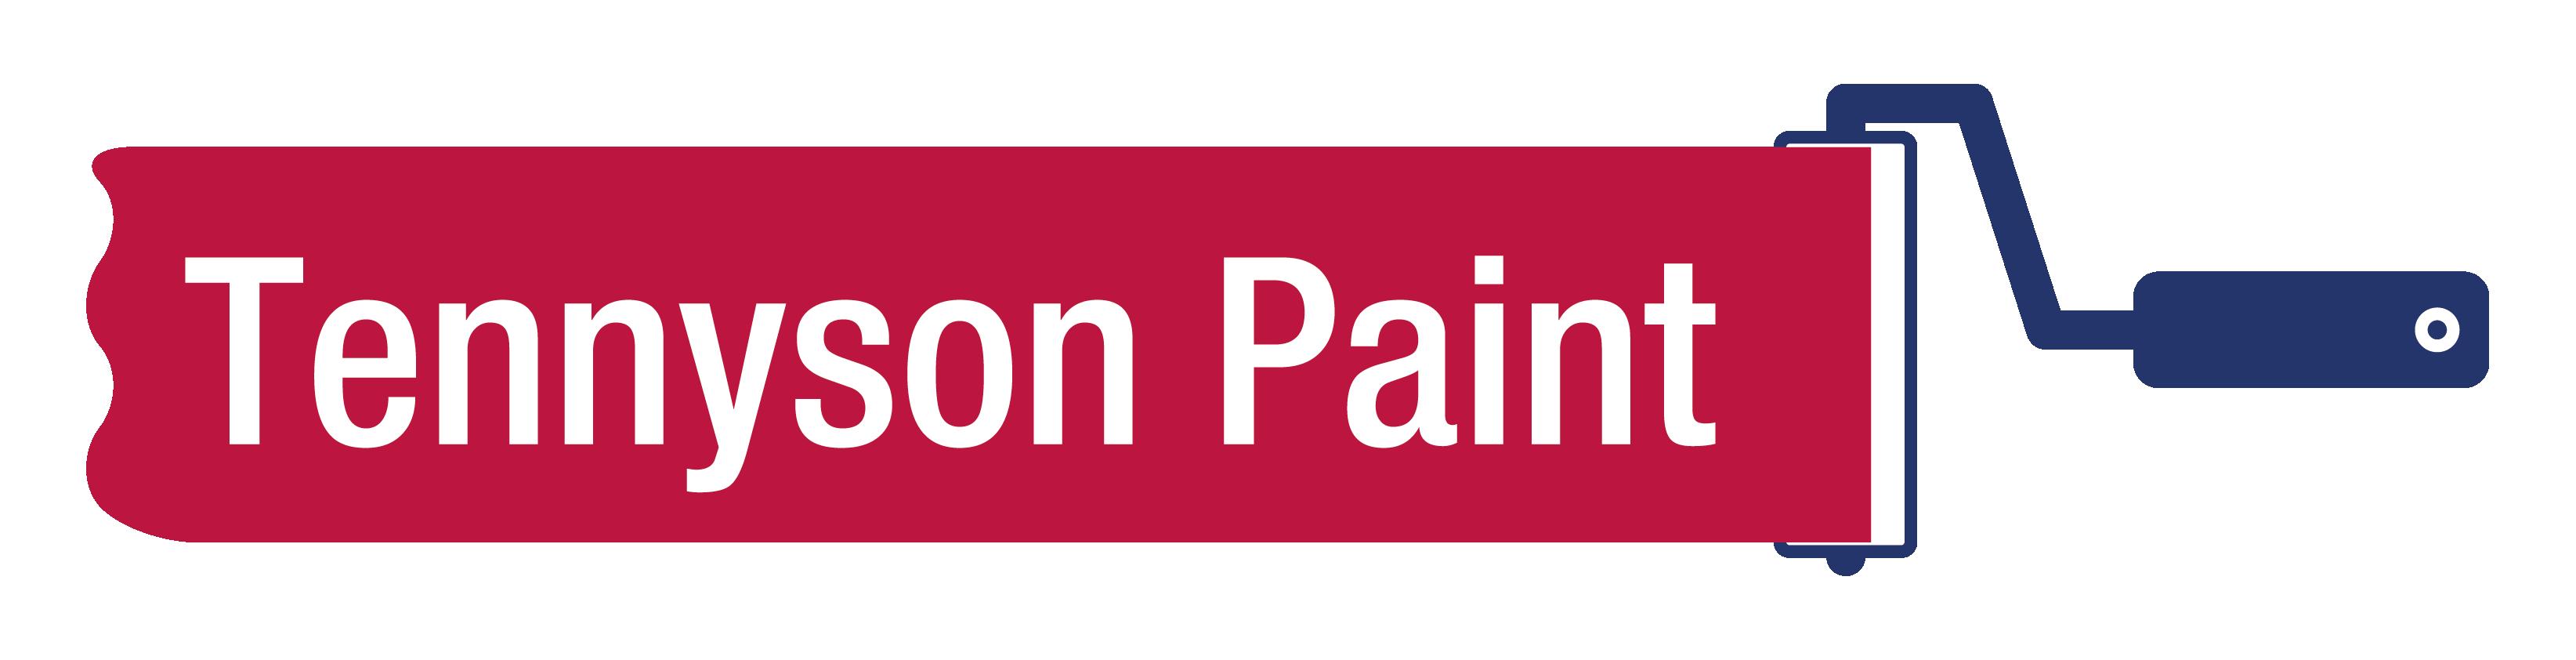 Tennyson Paint